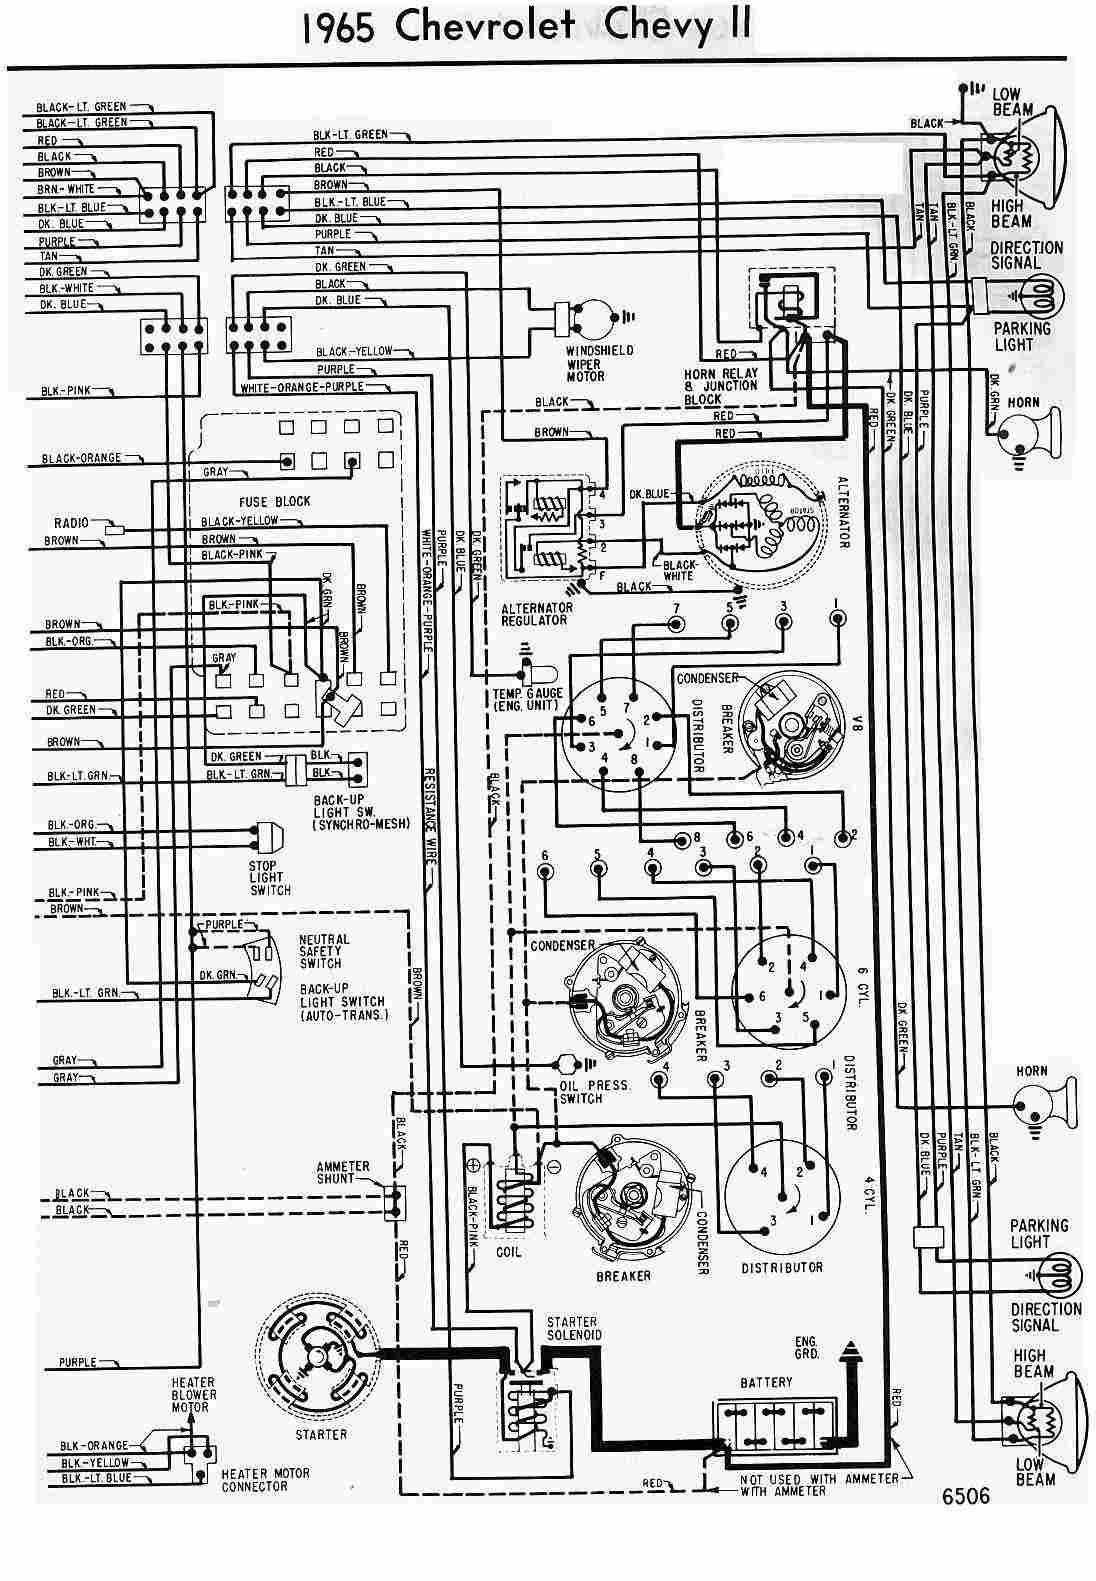 medium resolution of 1976 corvette dash wiring diagram schematic simple wiring diagramswiring diagram 1964 chevy corvette wiring diagrams 1977